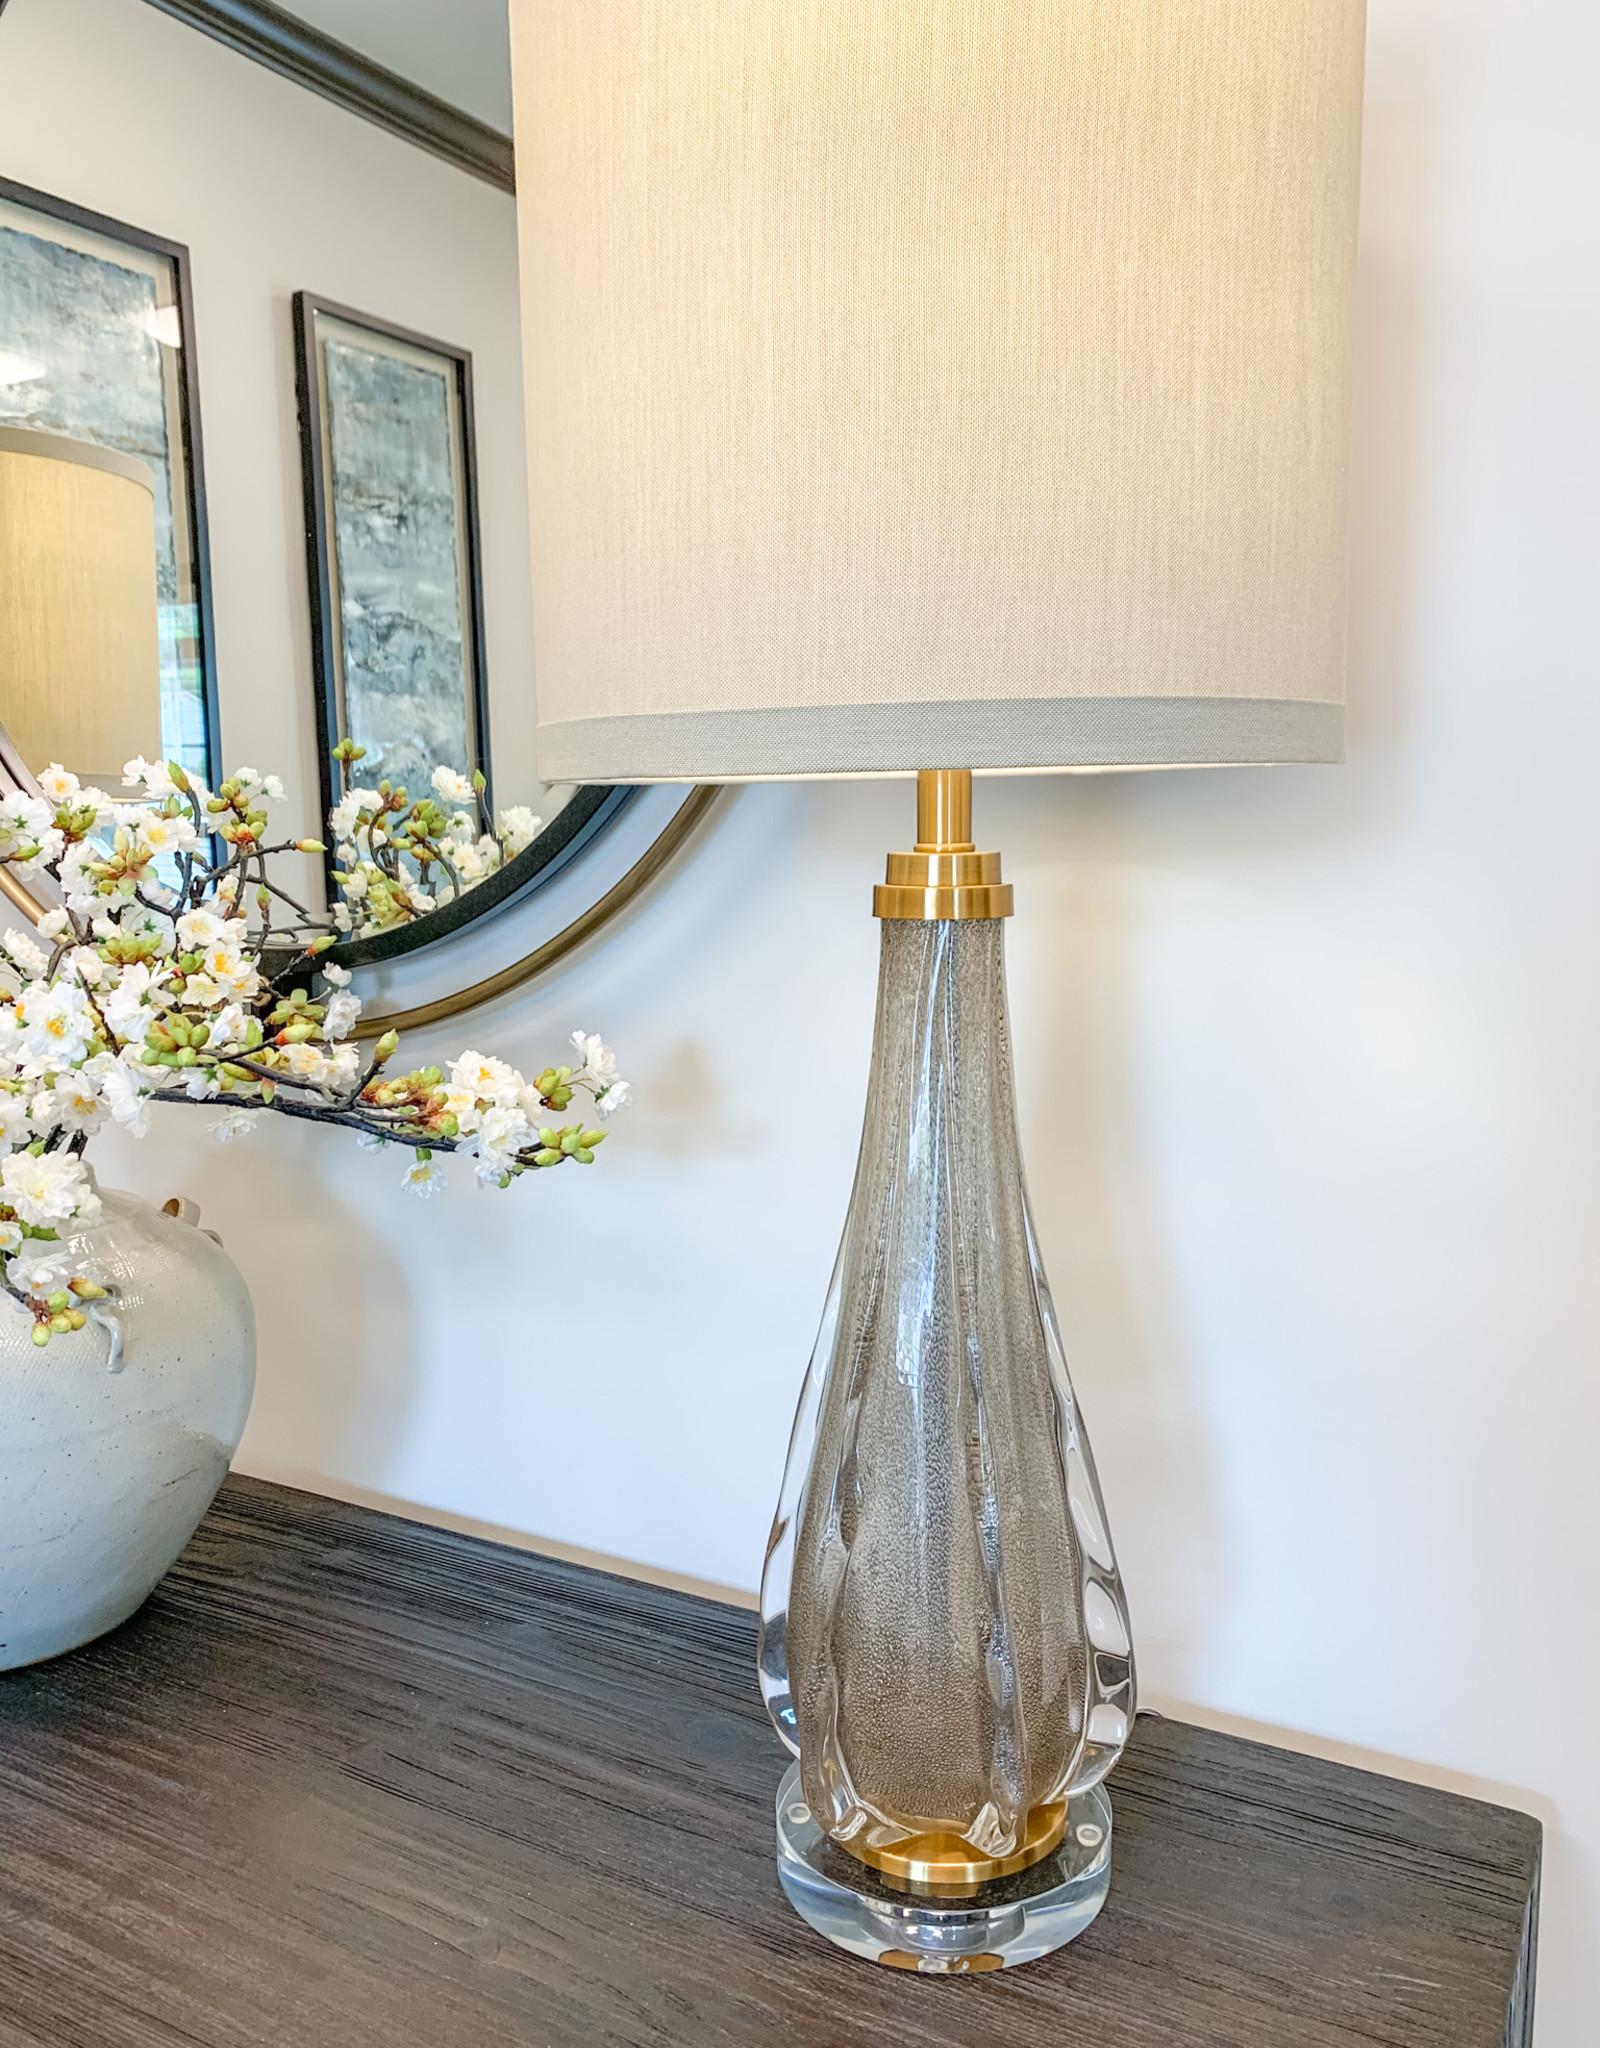 Victoire Buffet Lamp